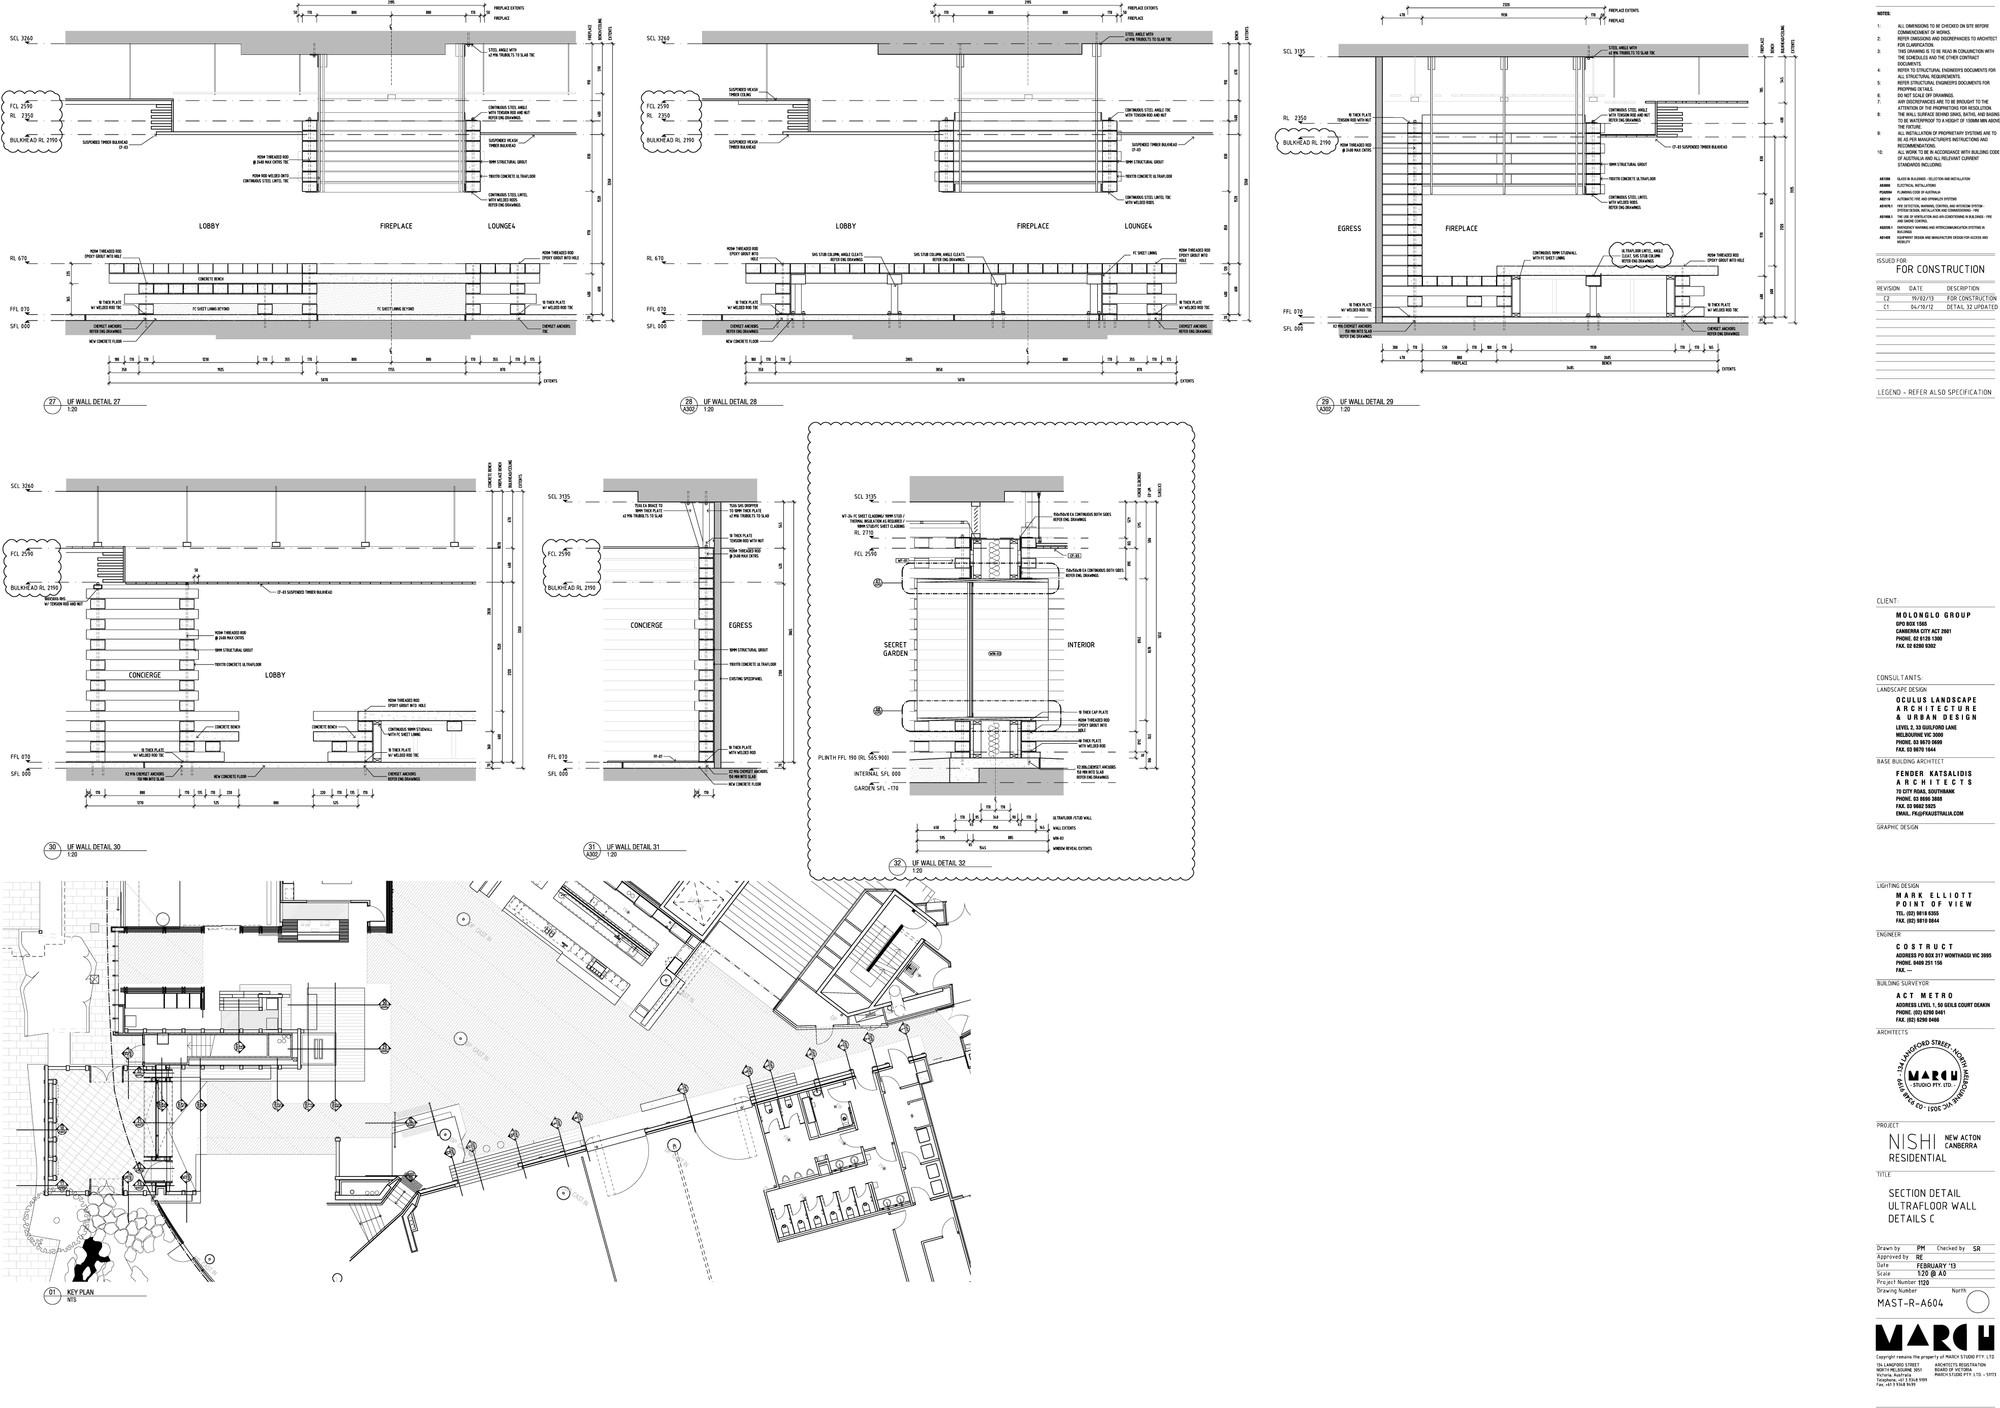 Hotel lobby floor plan - Hotel Hotel Lobby And Nishi Grand Stair Interior Detail